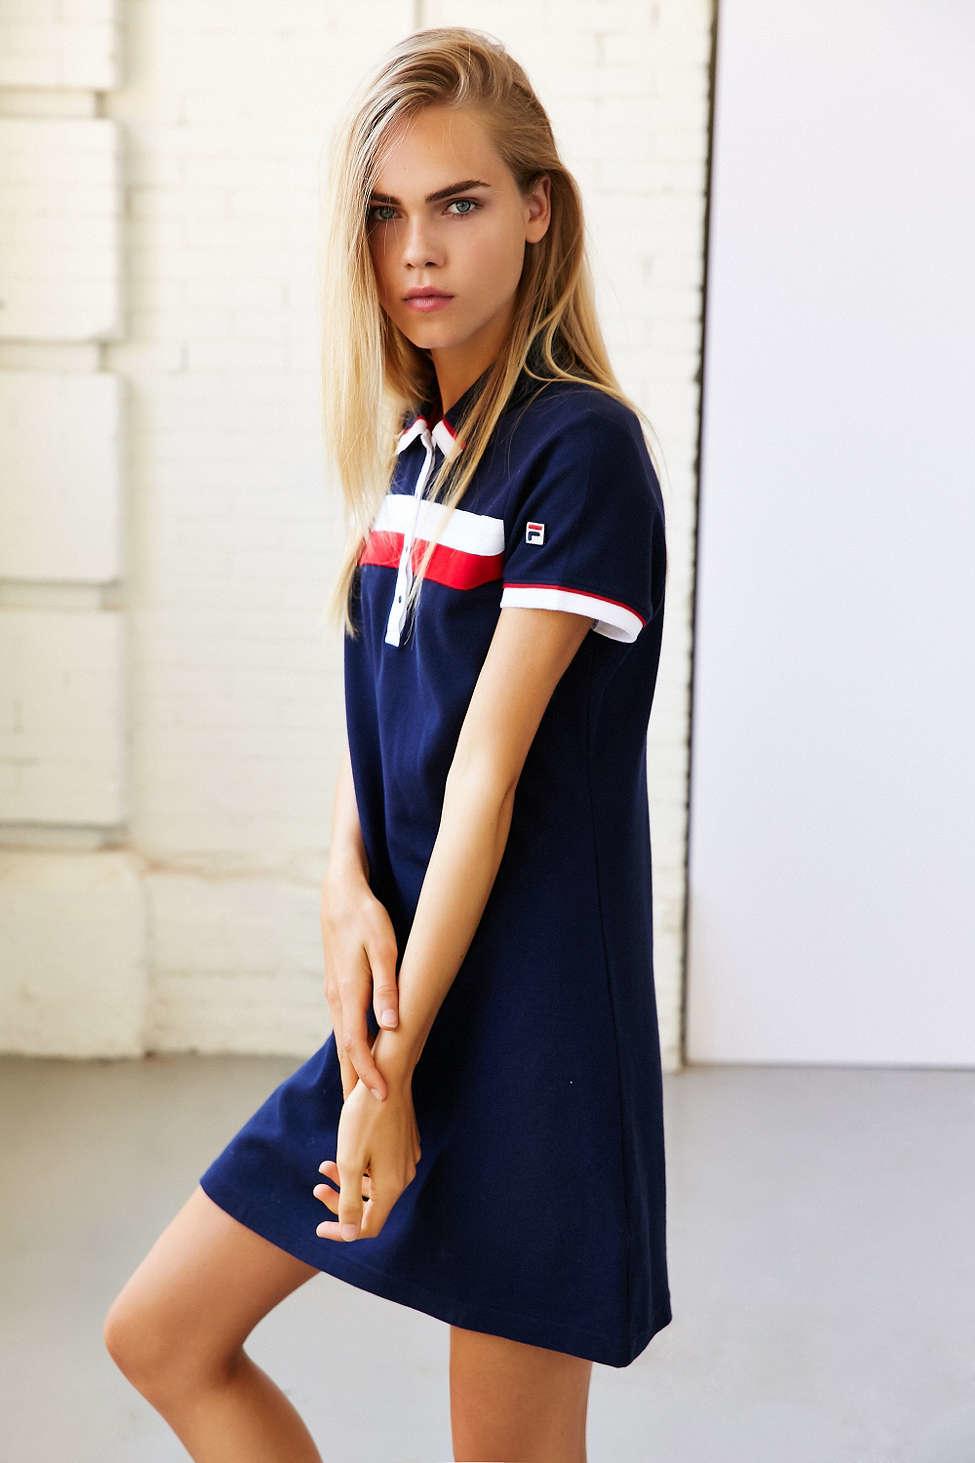 29 elegant Fila Outfit For Girls